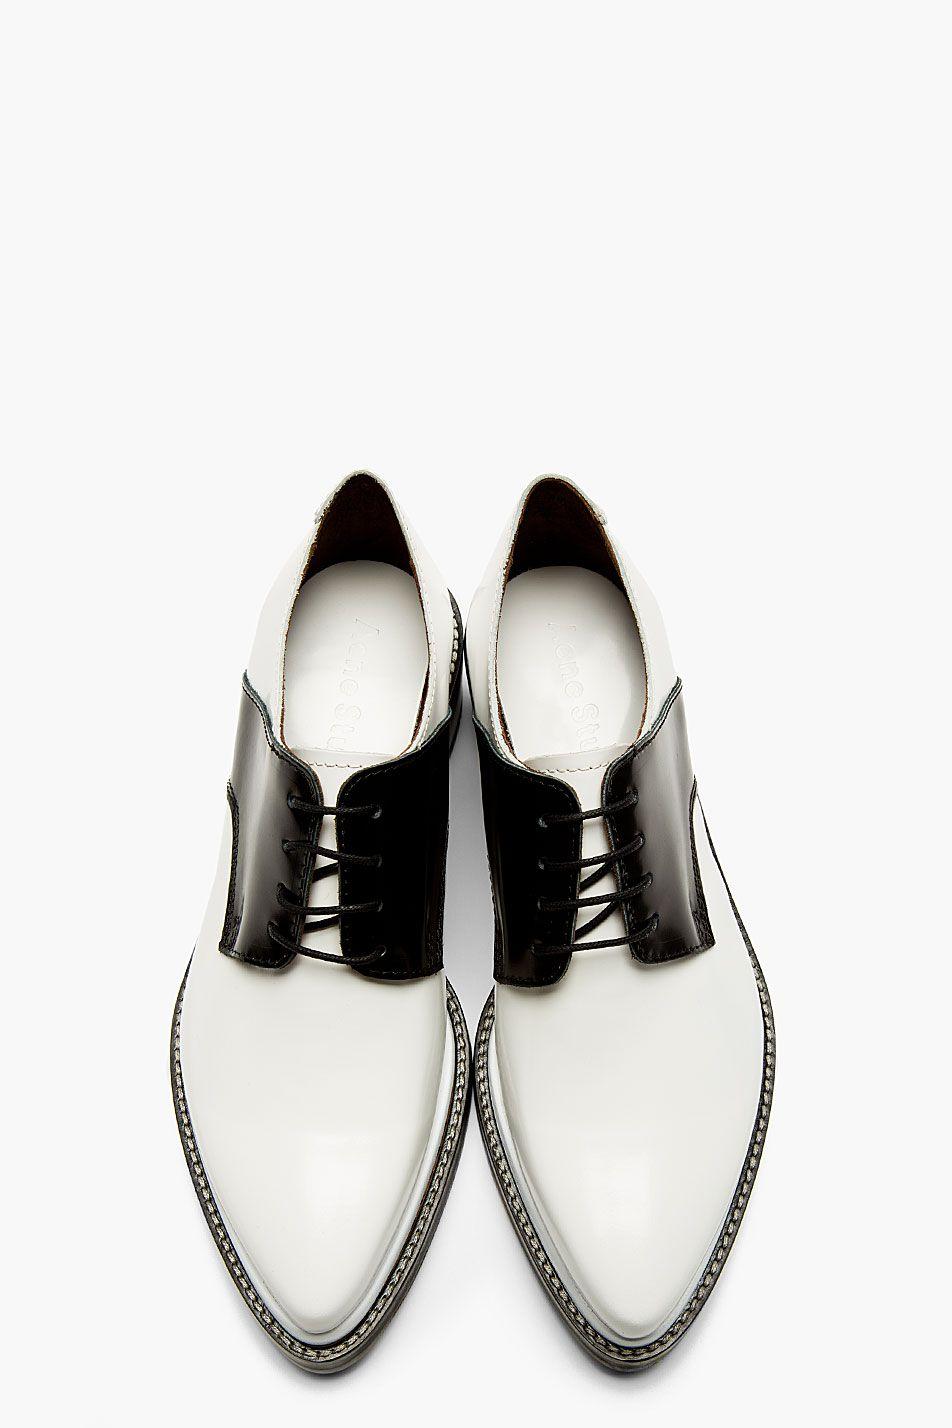 ACNE STUDIOS Black & White Lark Mix Saddle Shoes Acne Studios, Acne, fashion, minimal, minimalist, shoes